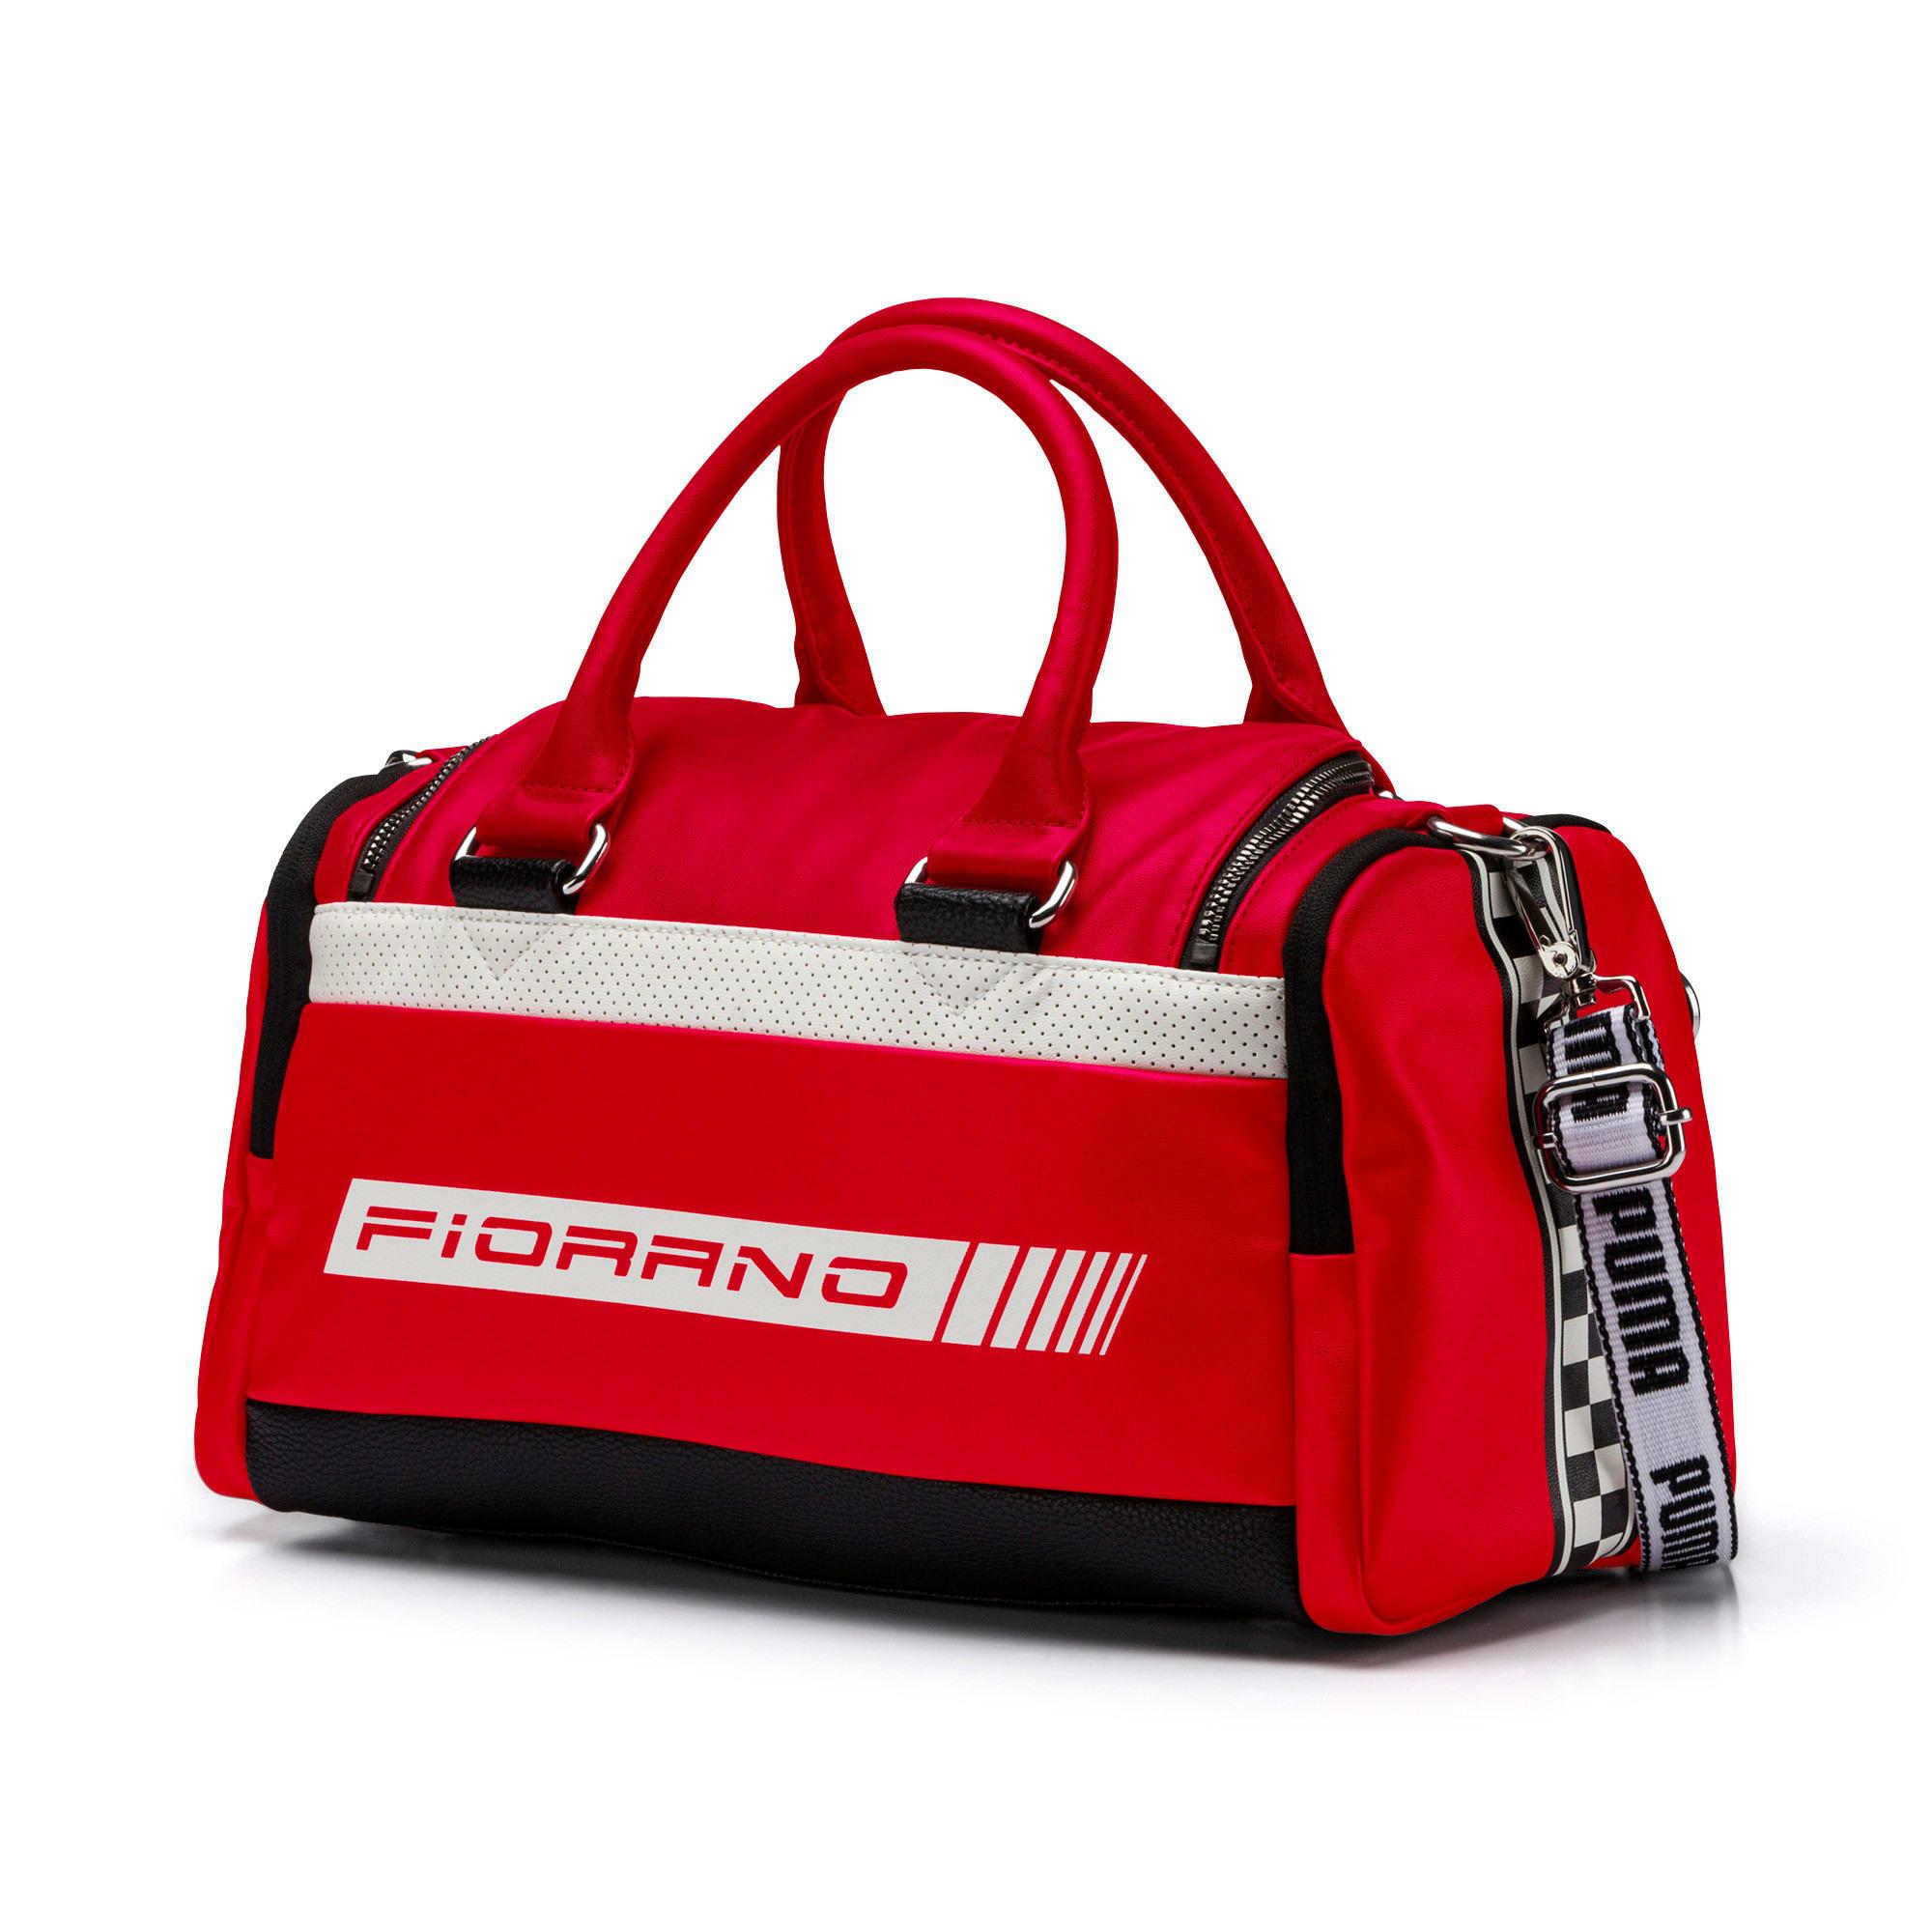 Thumbnail 3 of Sac à main Ferrari SpeedCat pour femme, Rosso Corsa, medium